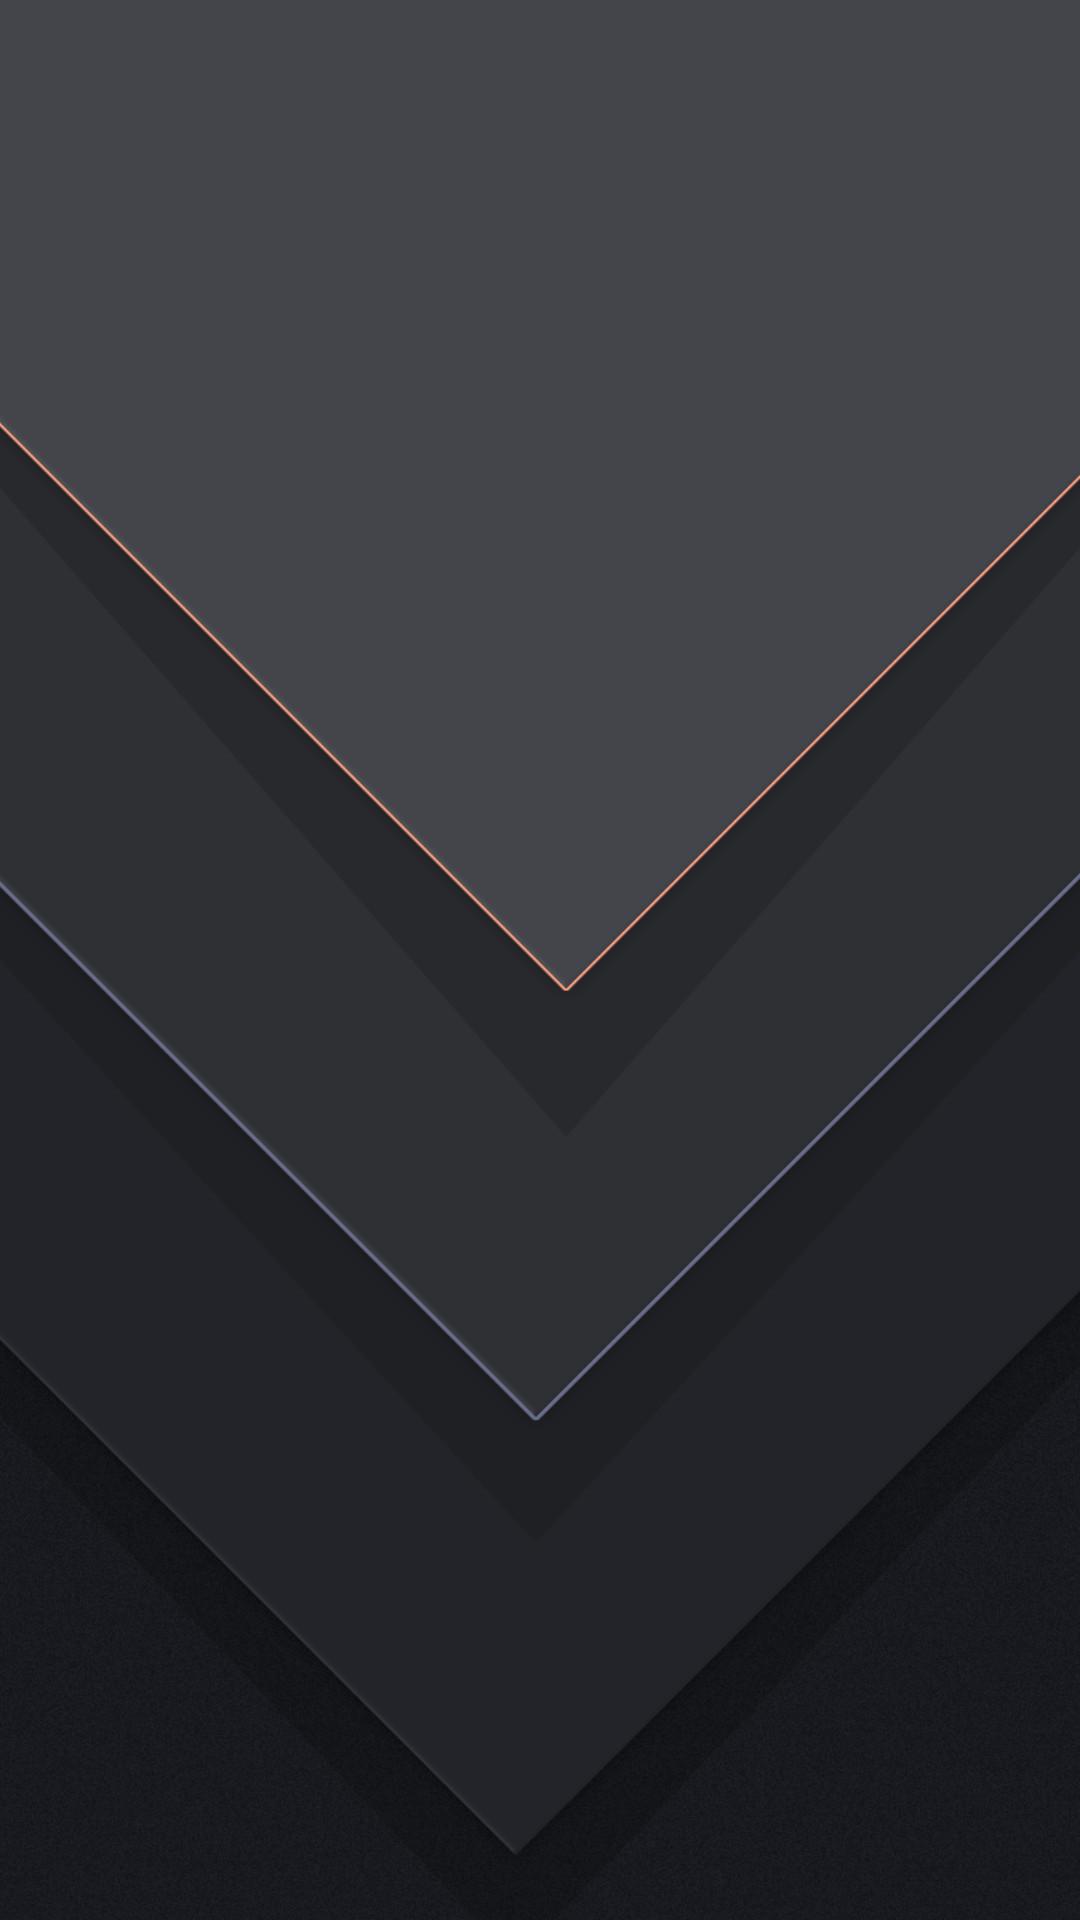 Res: 1080x1920, Dark-Grey-Material-Android-Wallpaper.png